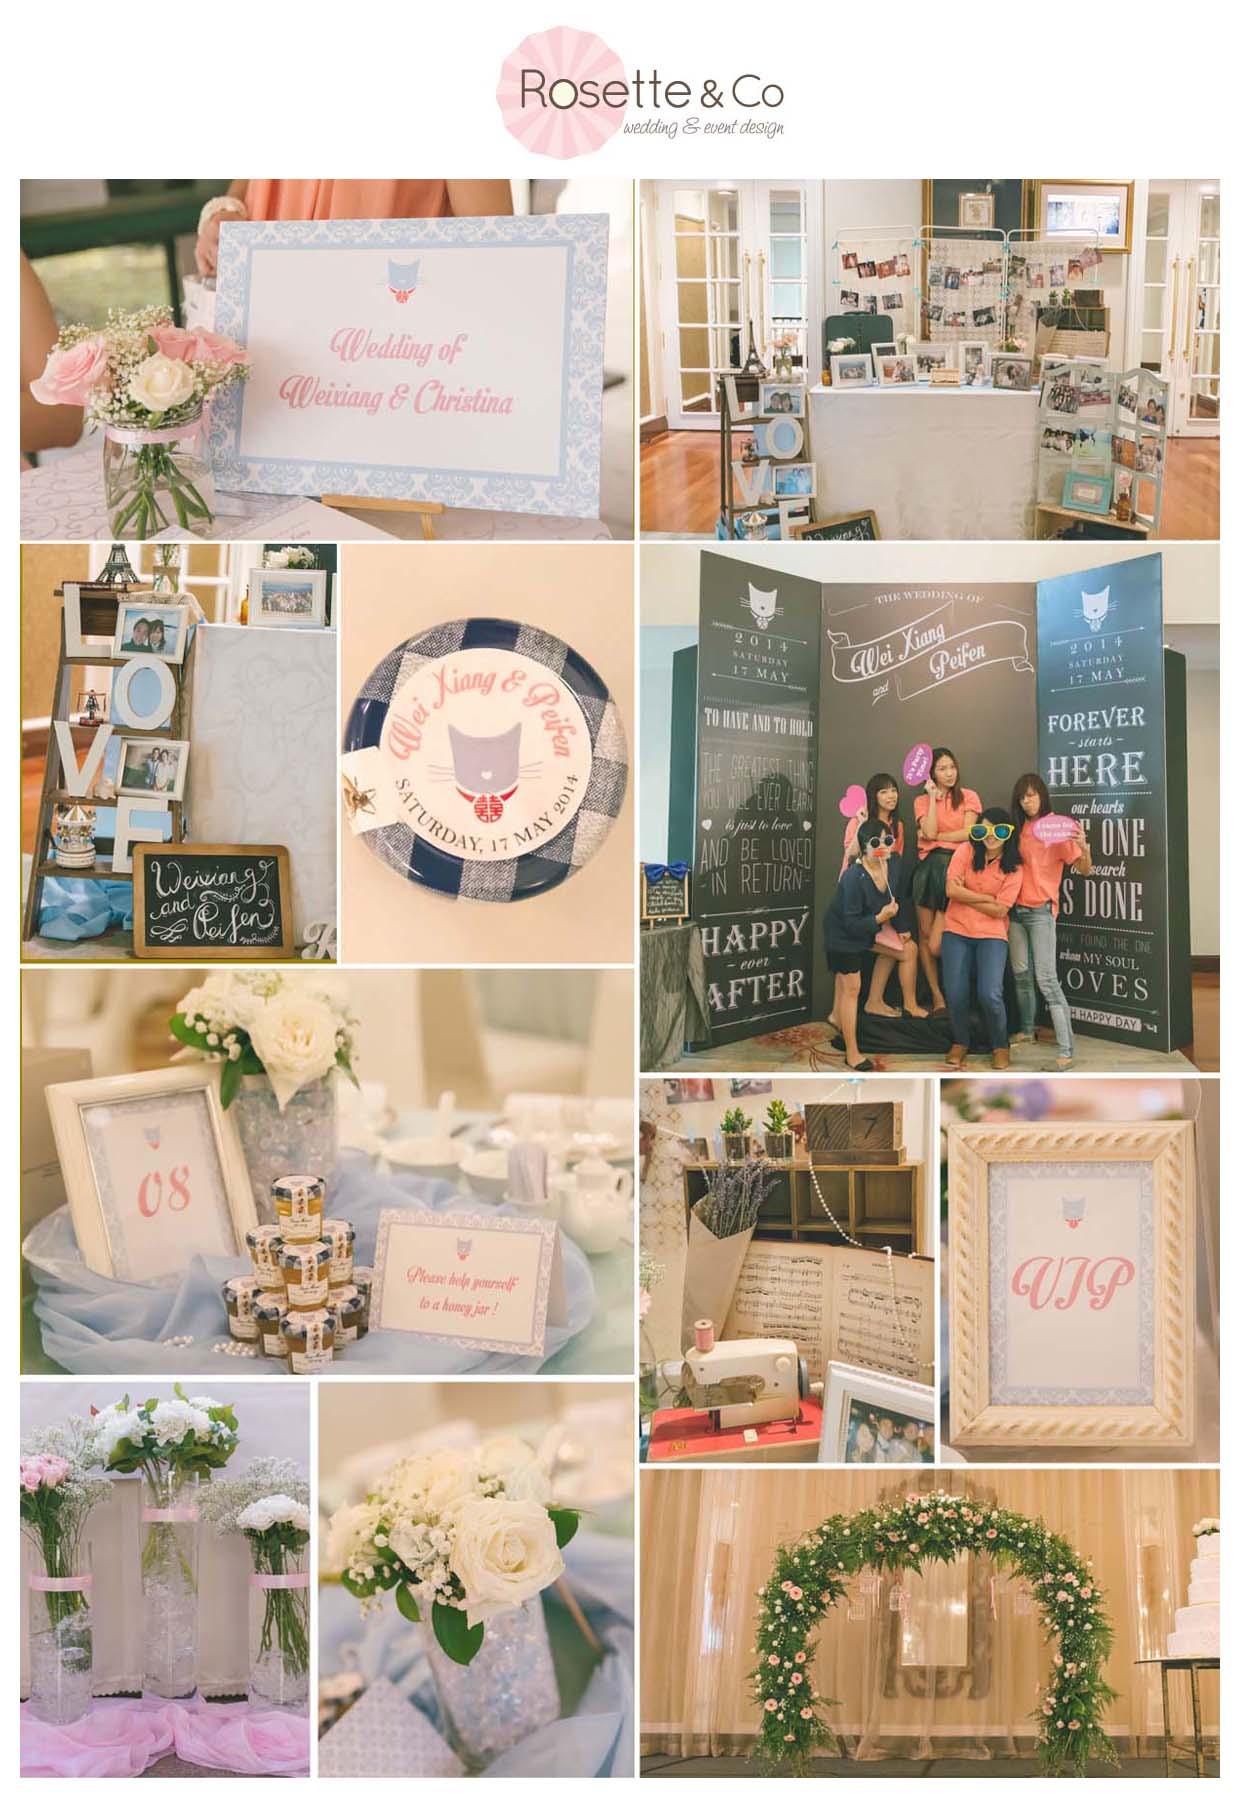 Elegant wedding reception decorations sg wedding real weddings w p intercontinental singapore we love junglespirit Gallery